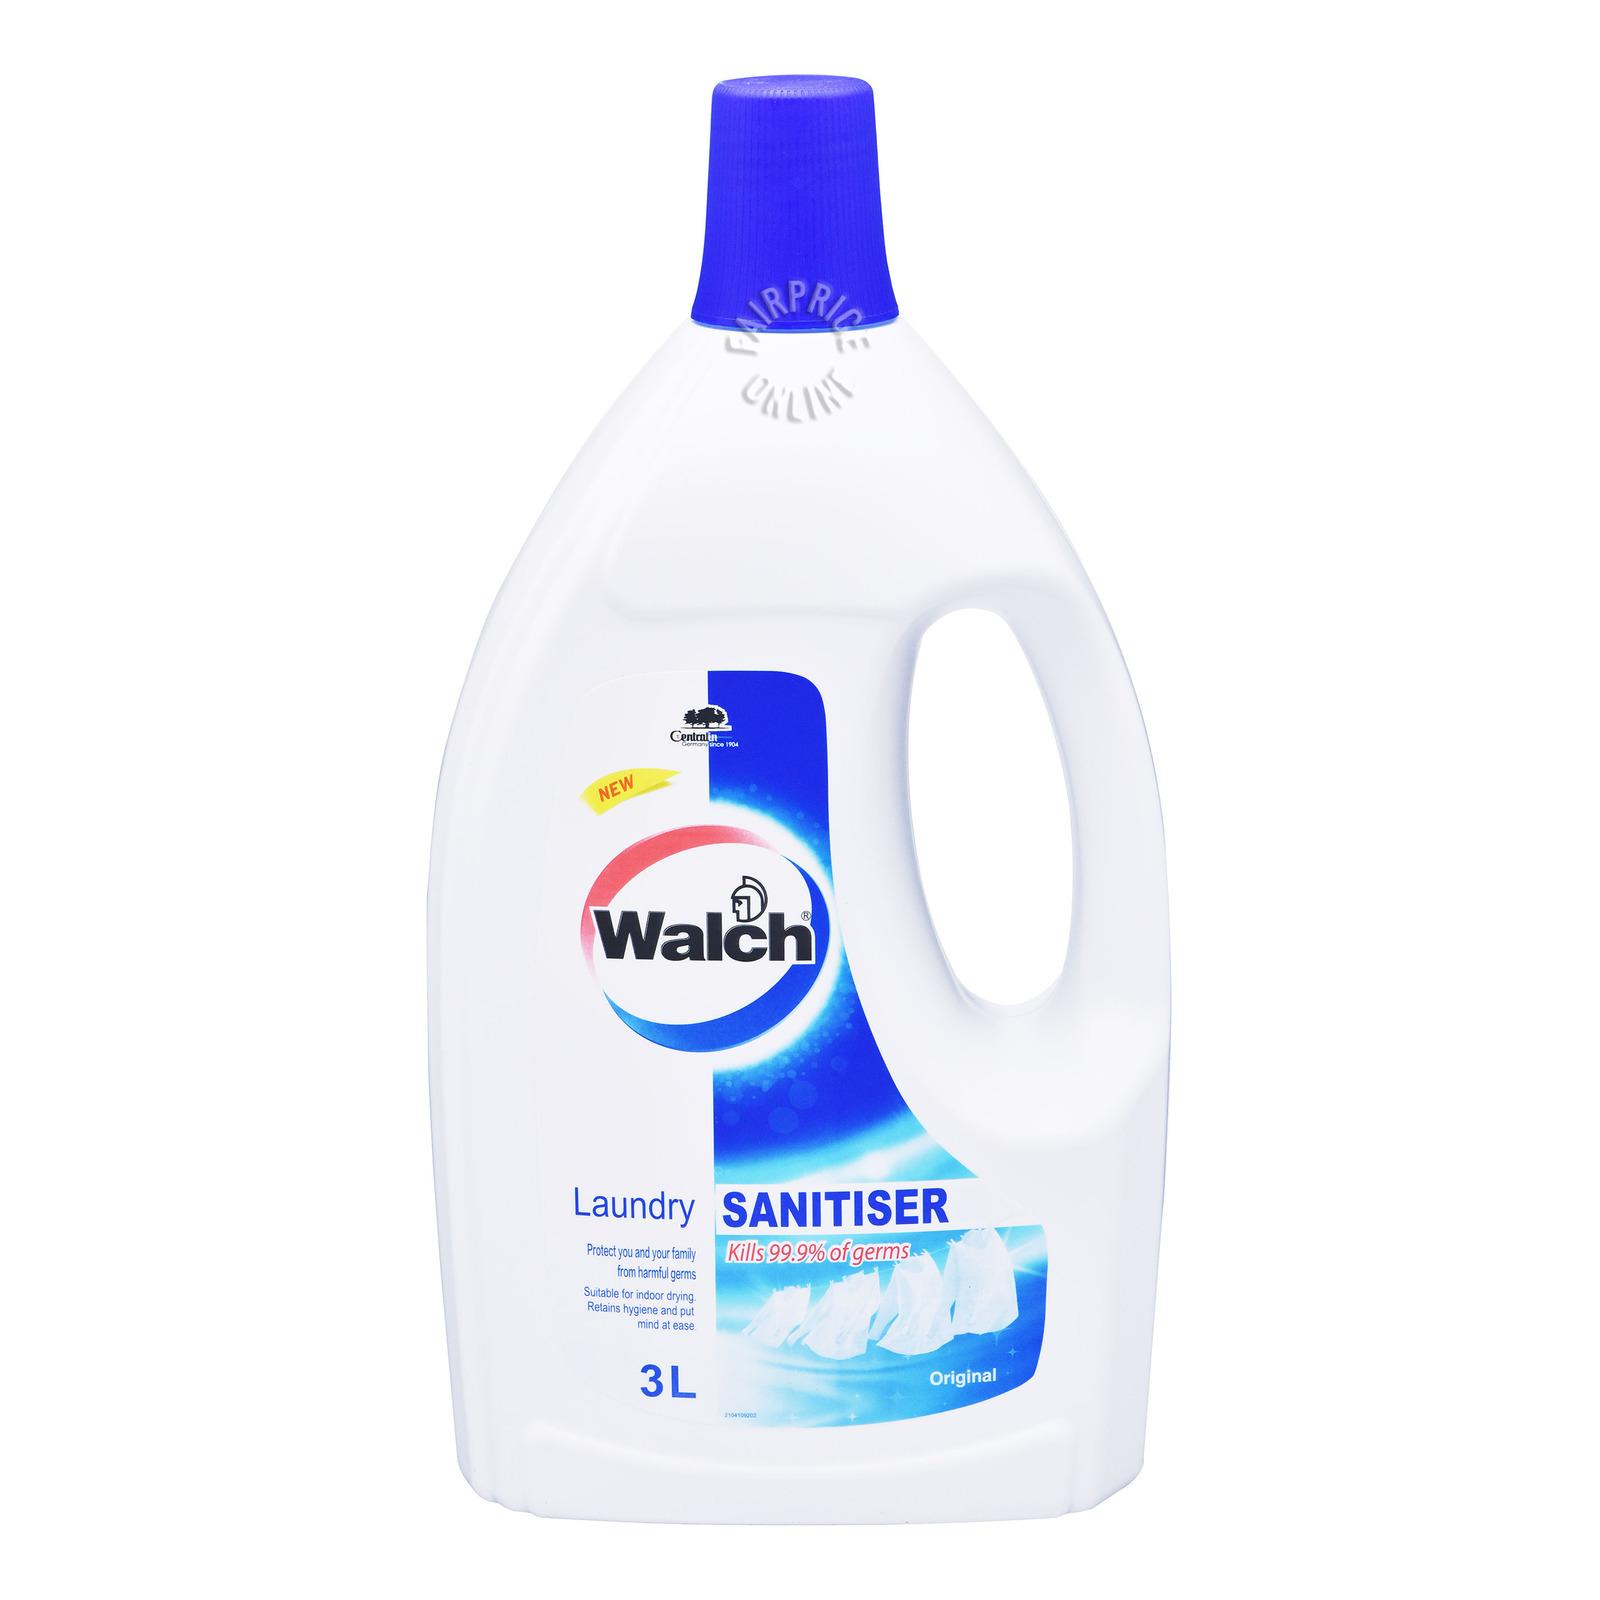 Walch Laundry Sanitizer - Fresh